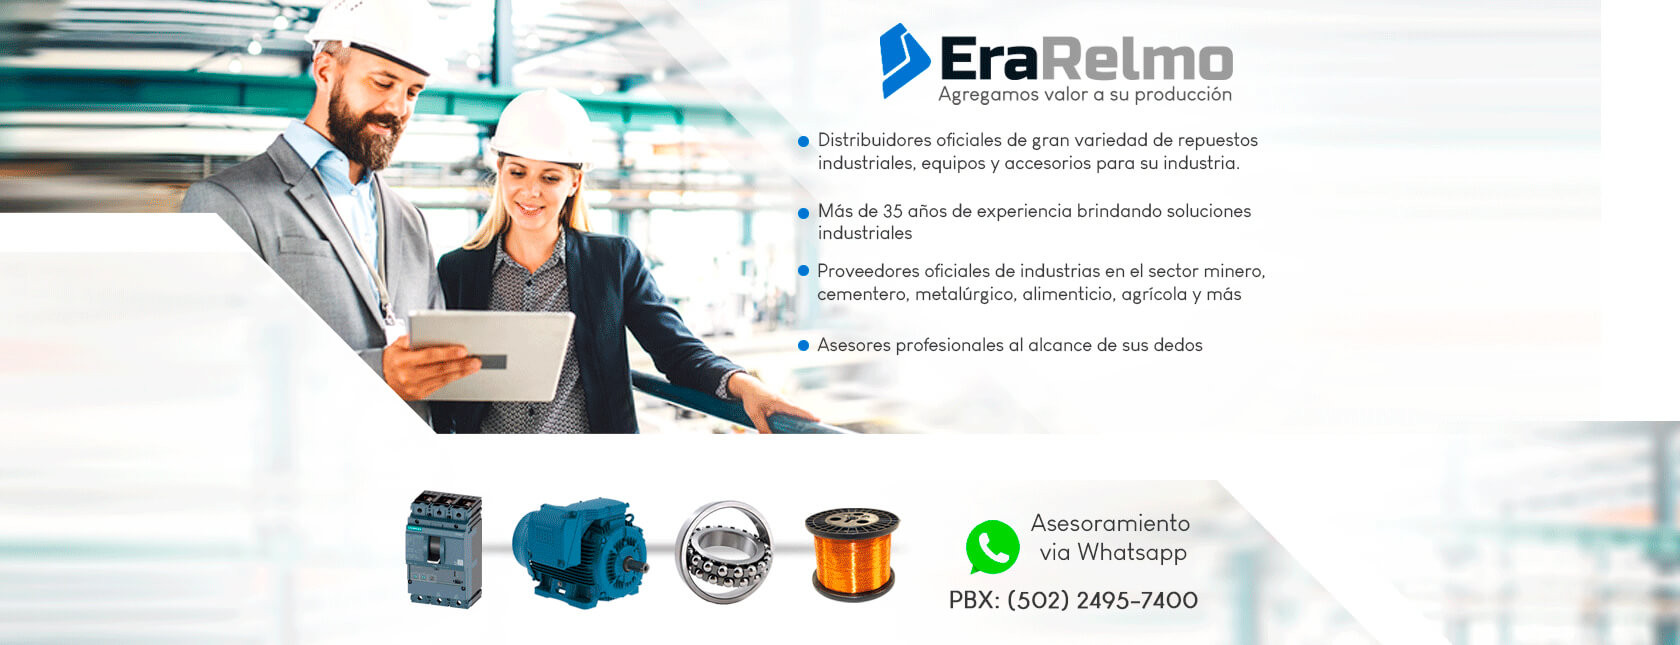 Banner-web-EraRelmo (3).jpg